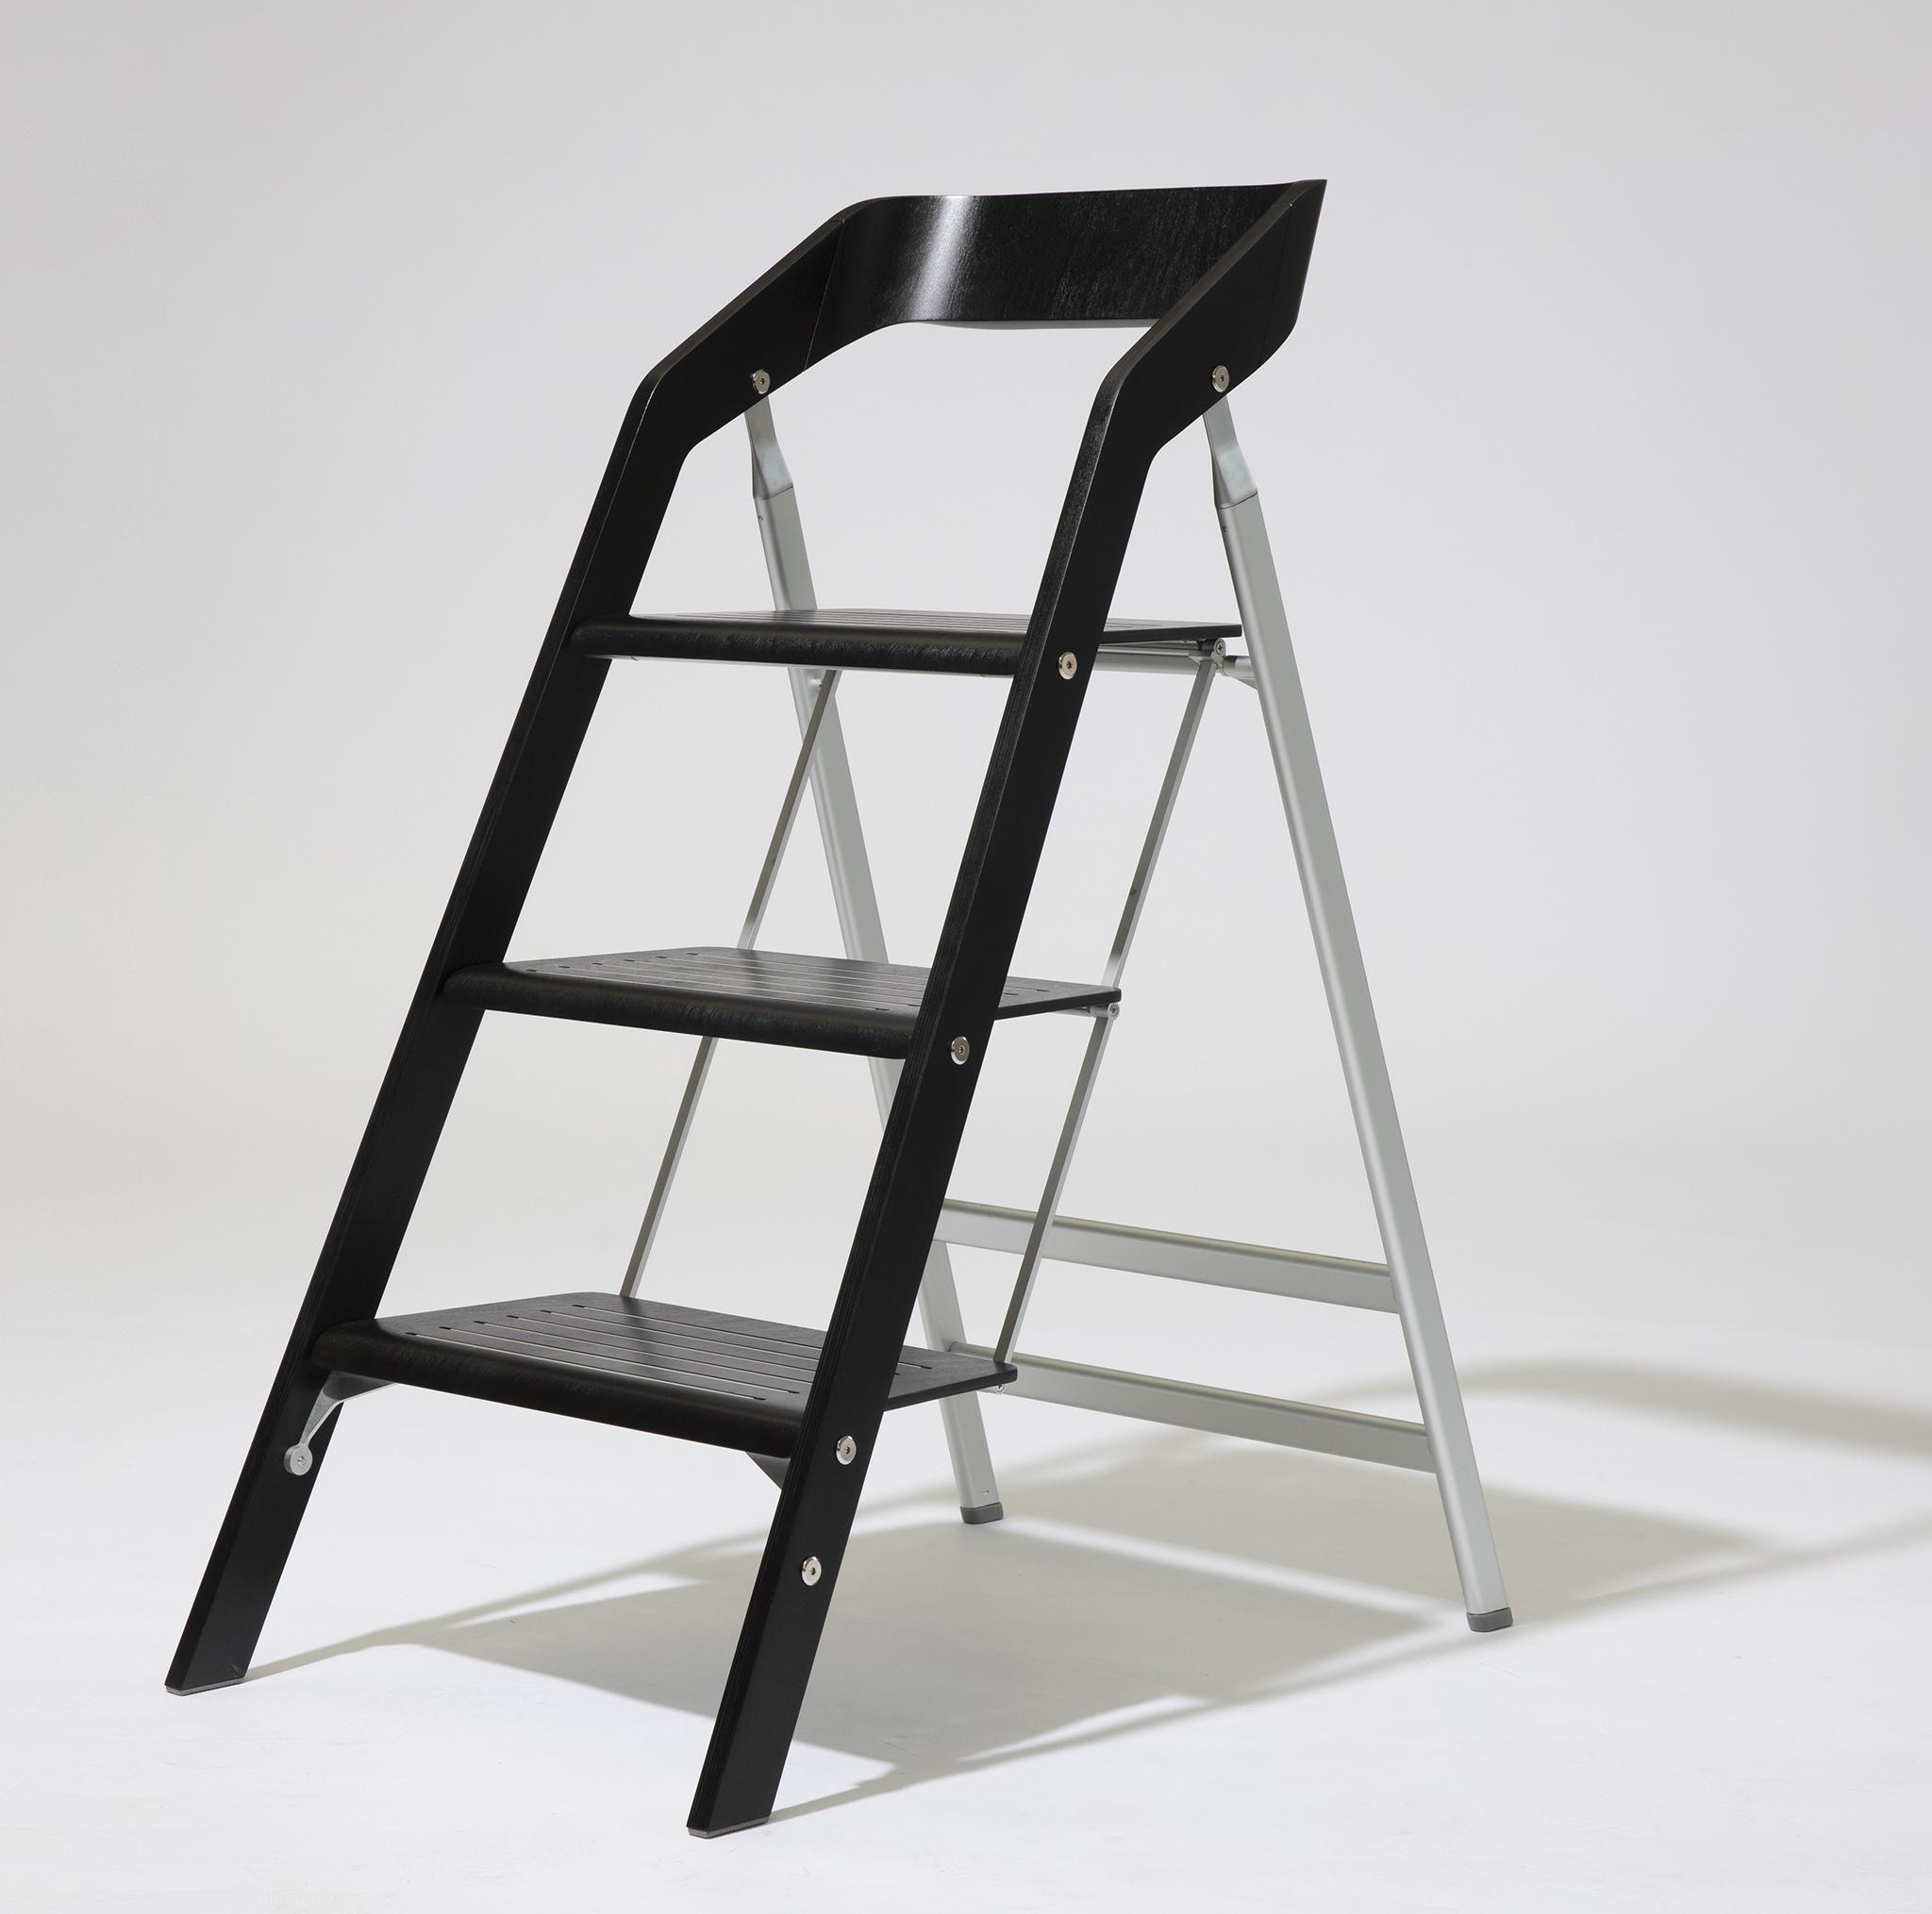 USIT Трехступенчатая лестница-стул USIT 3 STEP BLACK